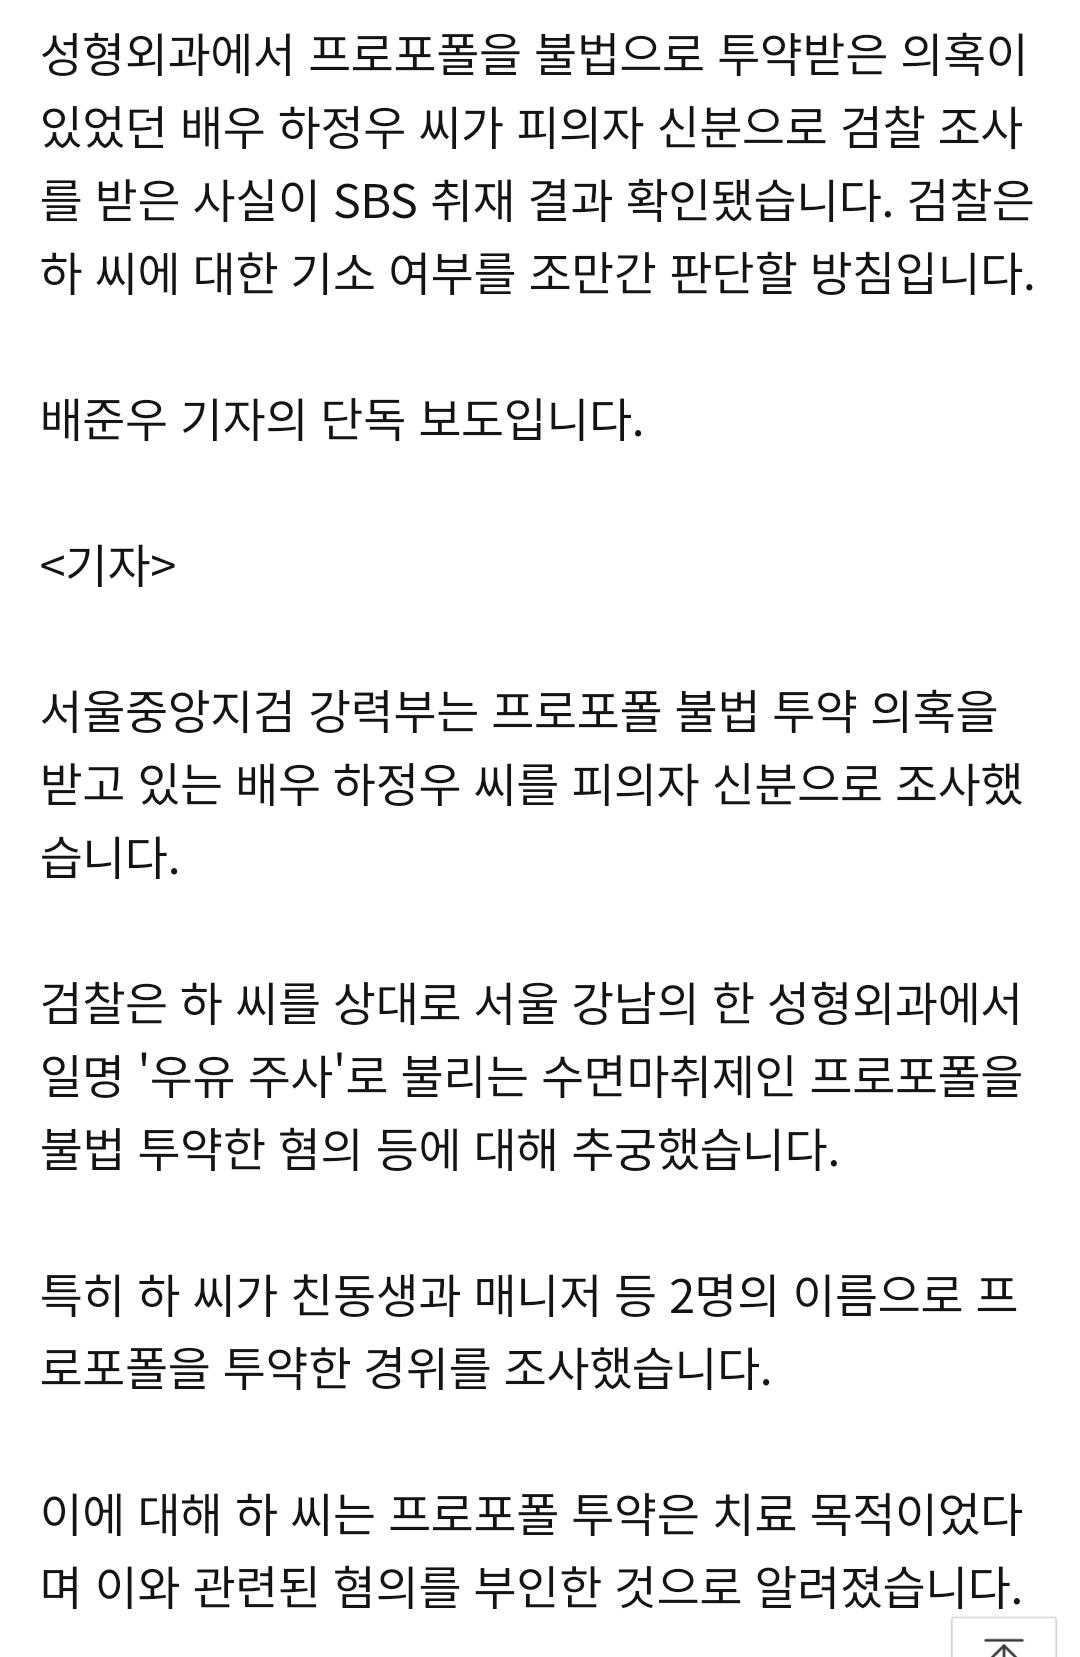 Capture+_2020-07-12-22-08-36.png [SBS] 배우 하정우, 프로포폴 의혹으로 피의자 신분 조사